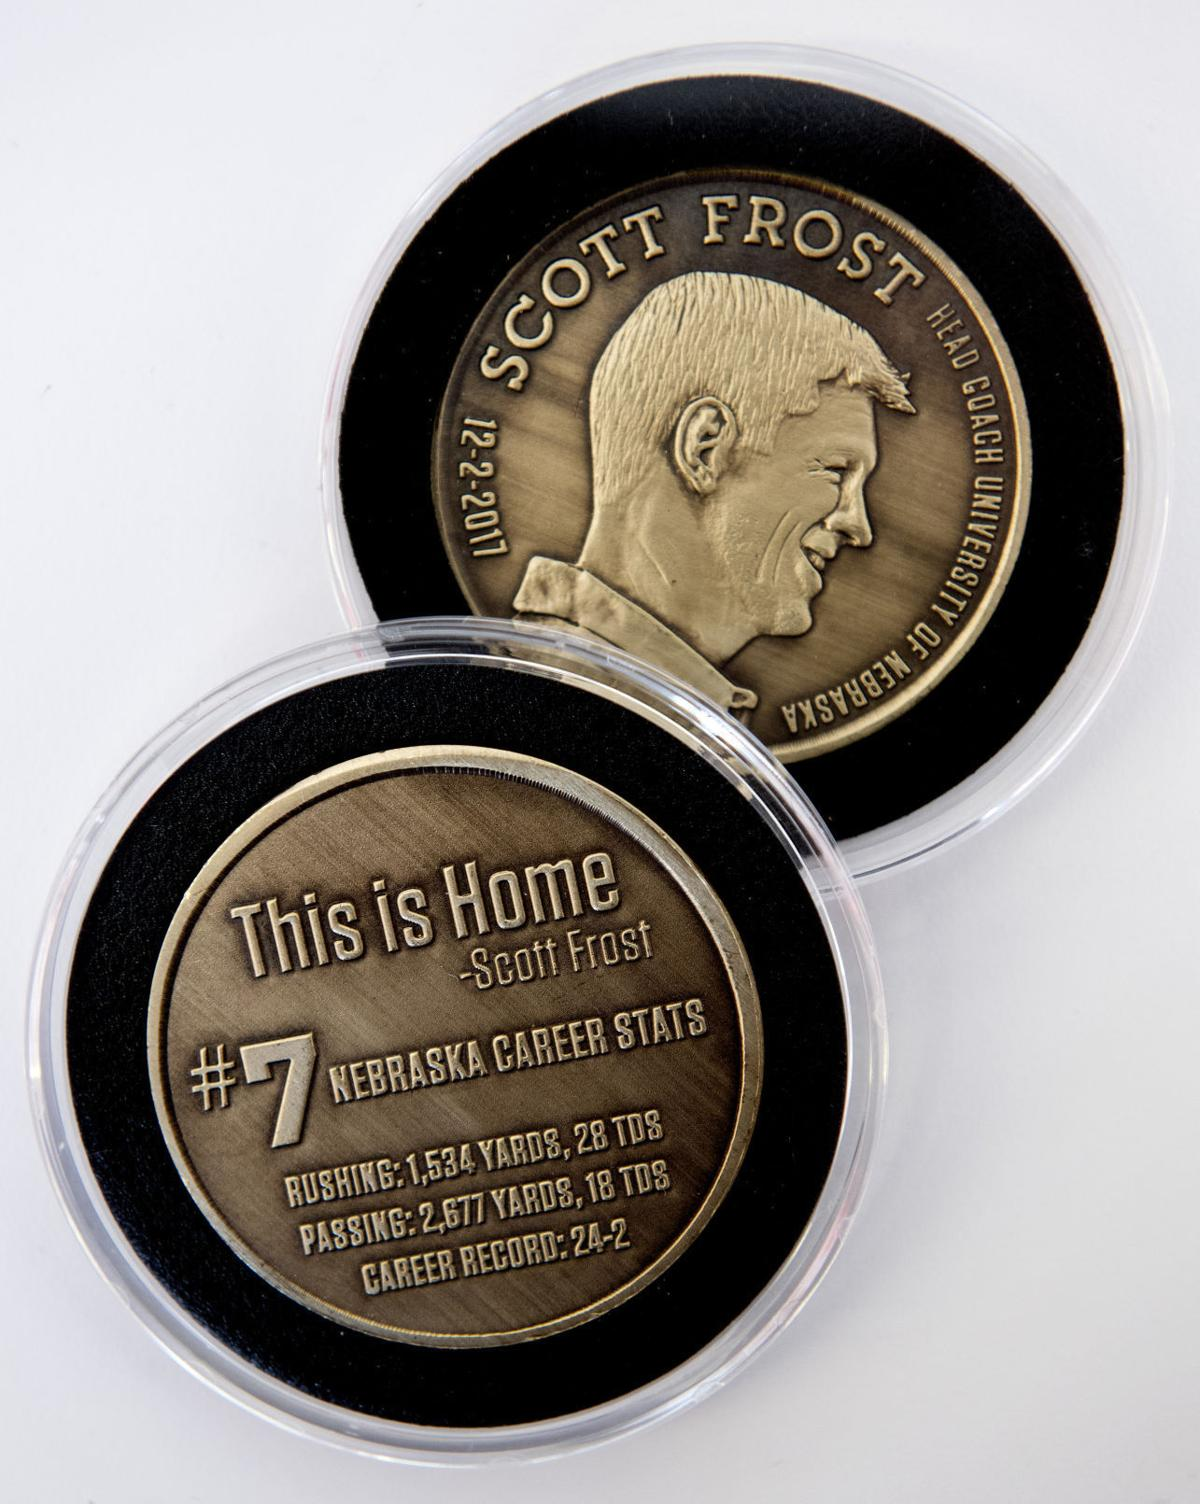 Scott Frost merchandise